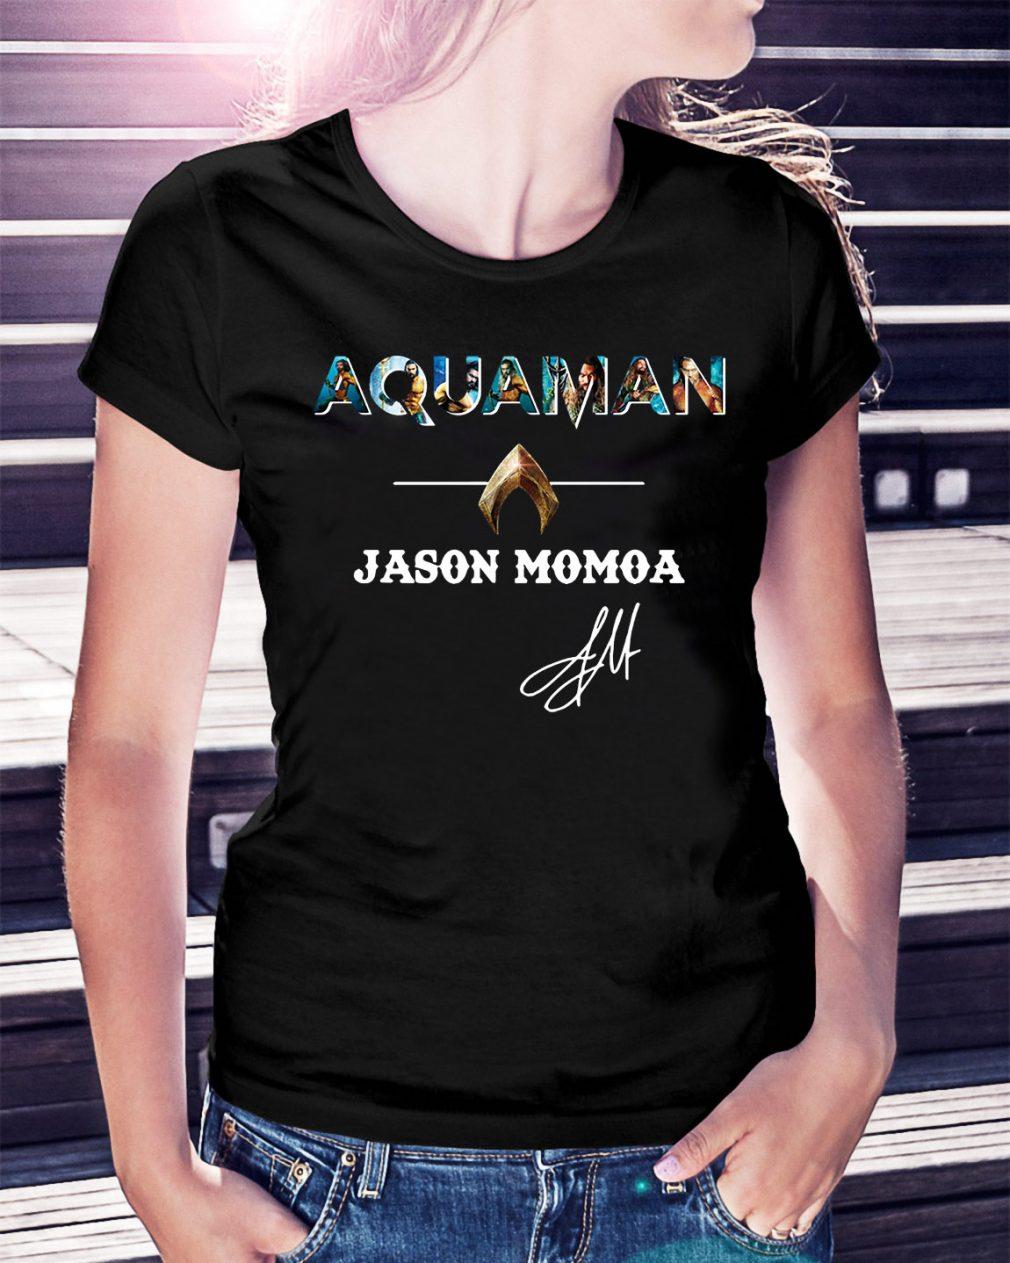 The Atlantis Aquaman Jason Momoa Ladies Tee